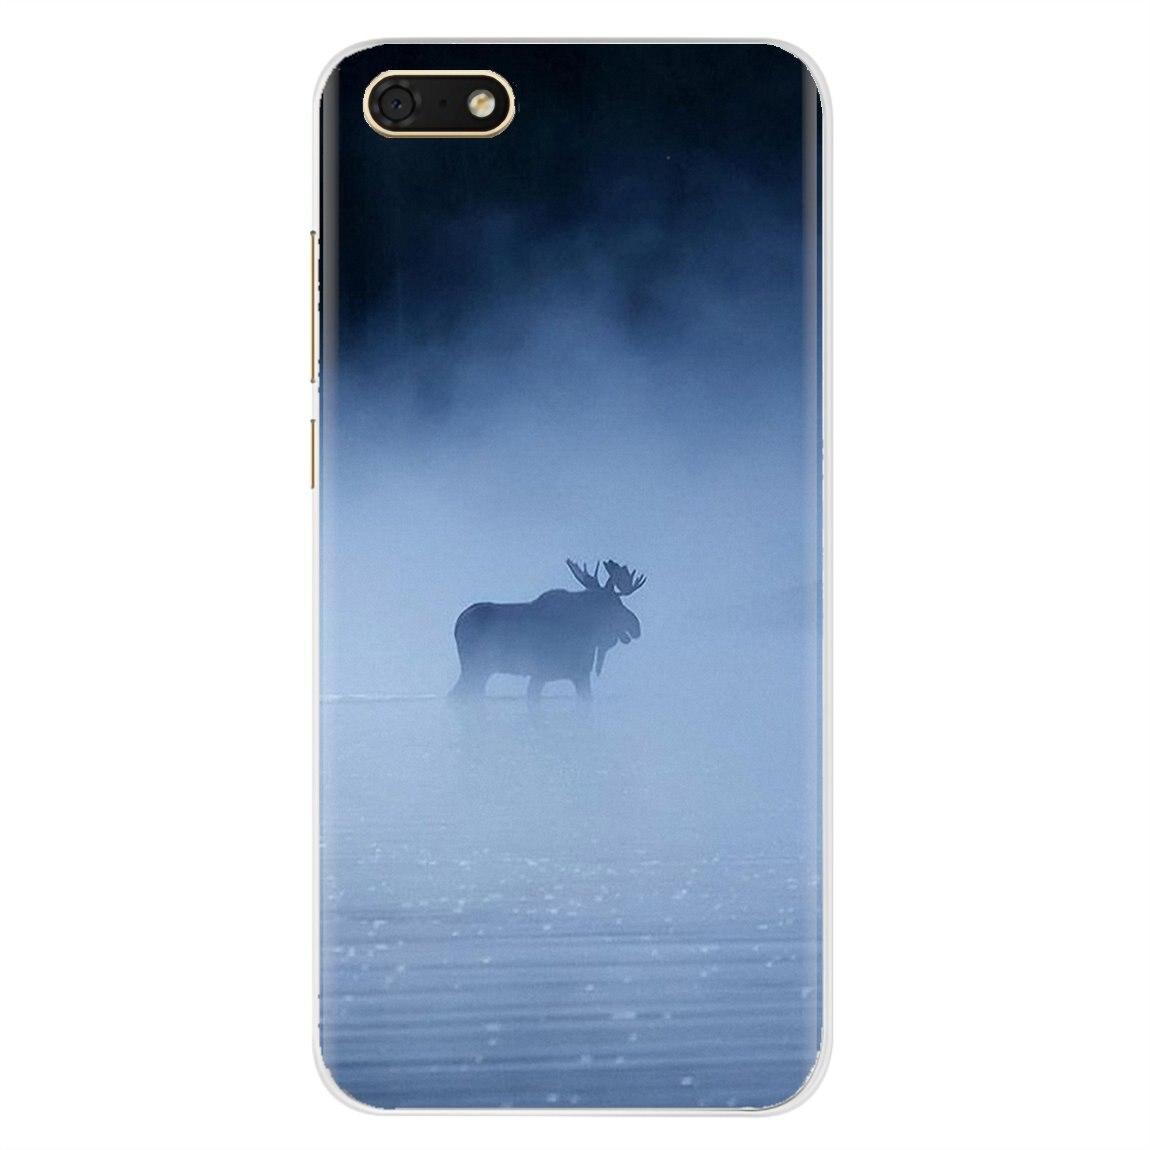 Para Samsung Galaxy J1 J2 J3 J4 J5 J6 J7 J8 Plus 2018 Prime 2015 2016 2017 animación funda de teléfono de silicona Animal Alaska Bull alce